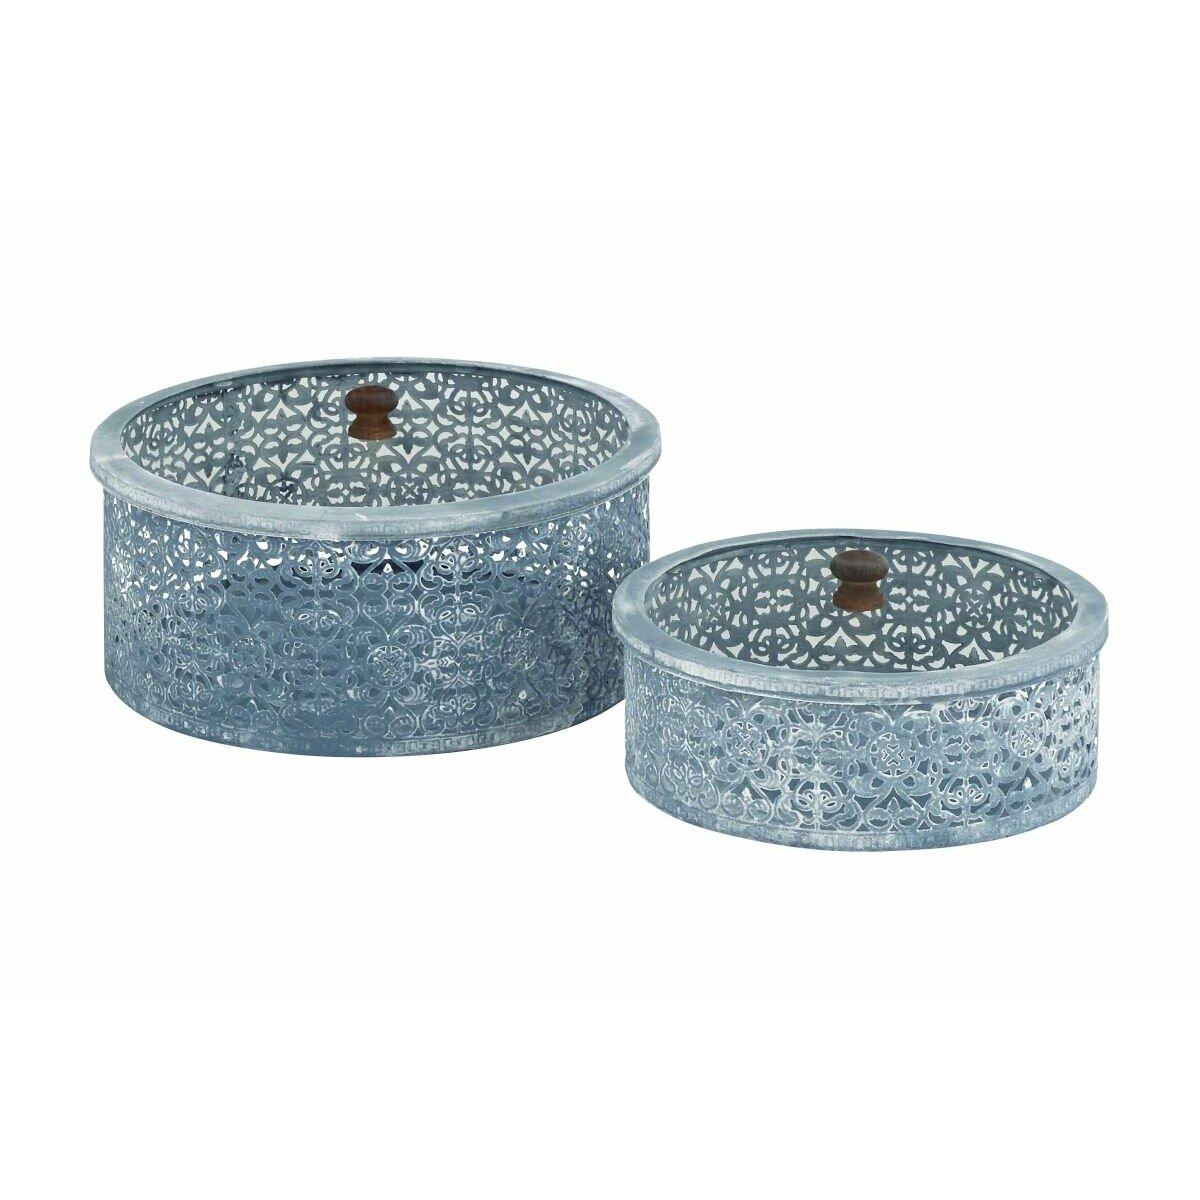 Metal glass with lids 2 piece decorative box set reviews for Decor containers coles